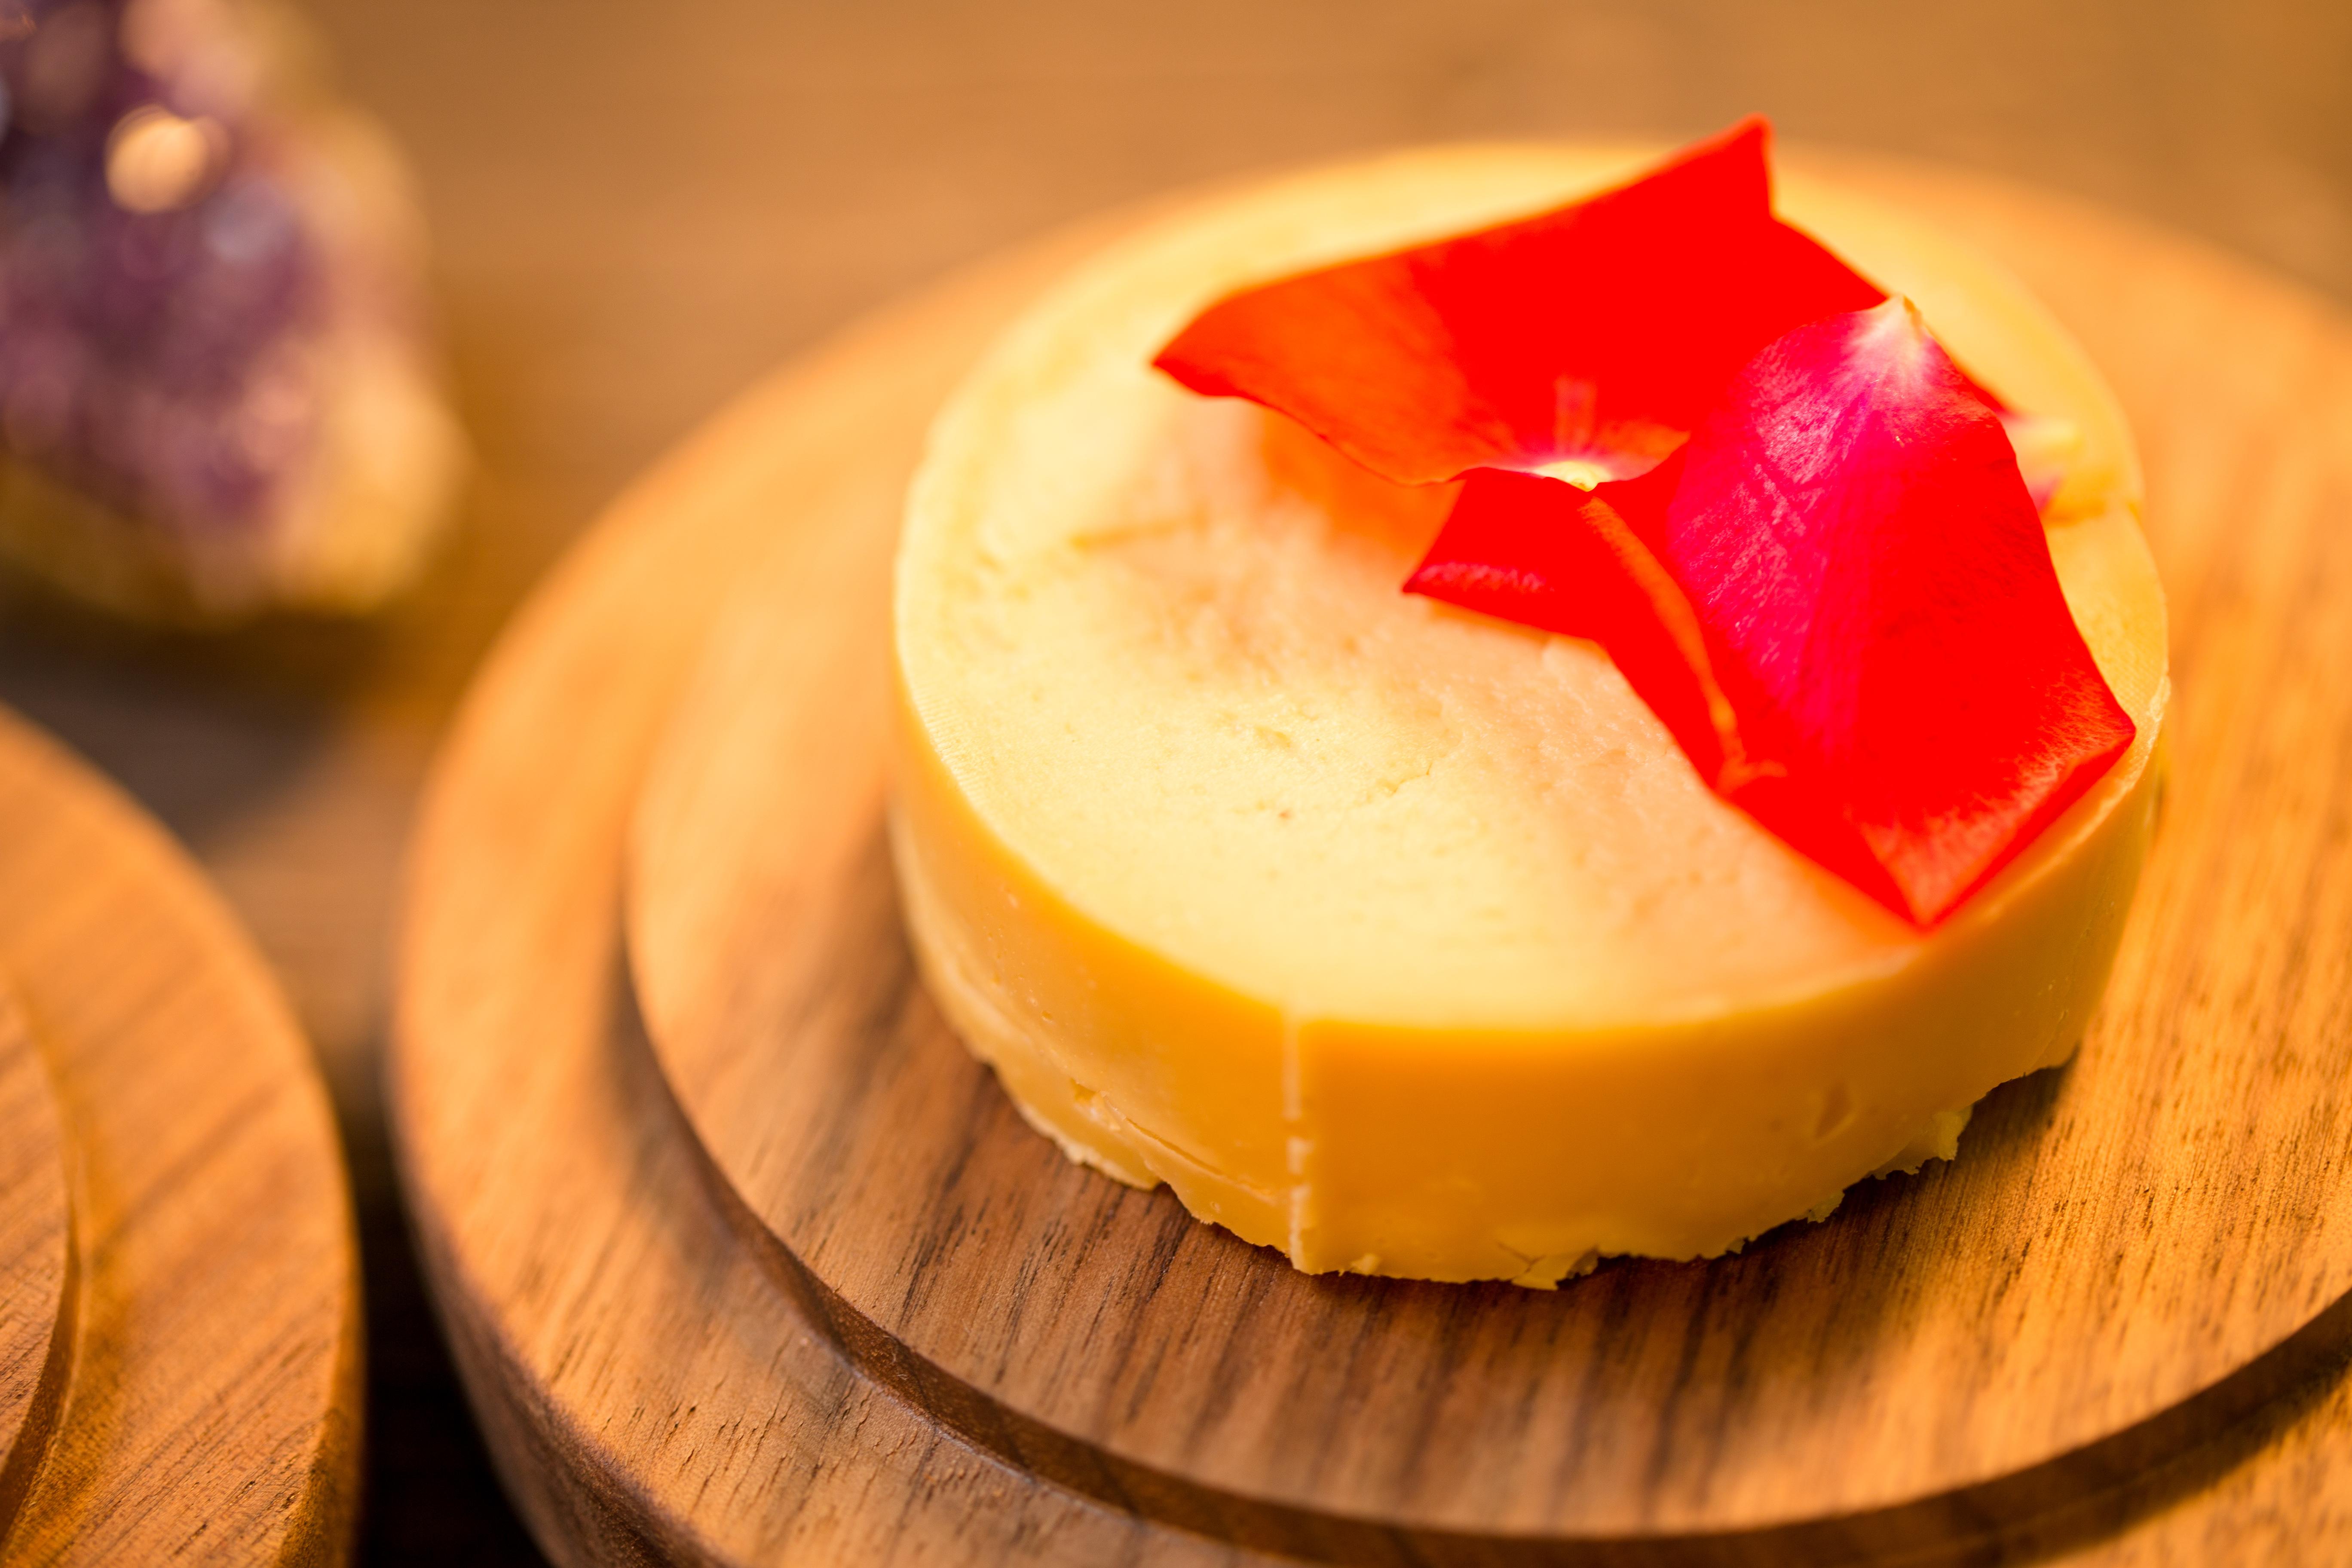 Smoked cheddar cheese - 90 grams